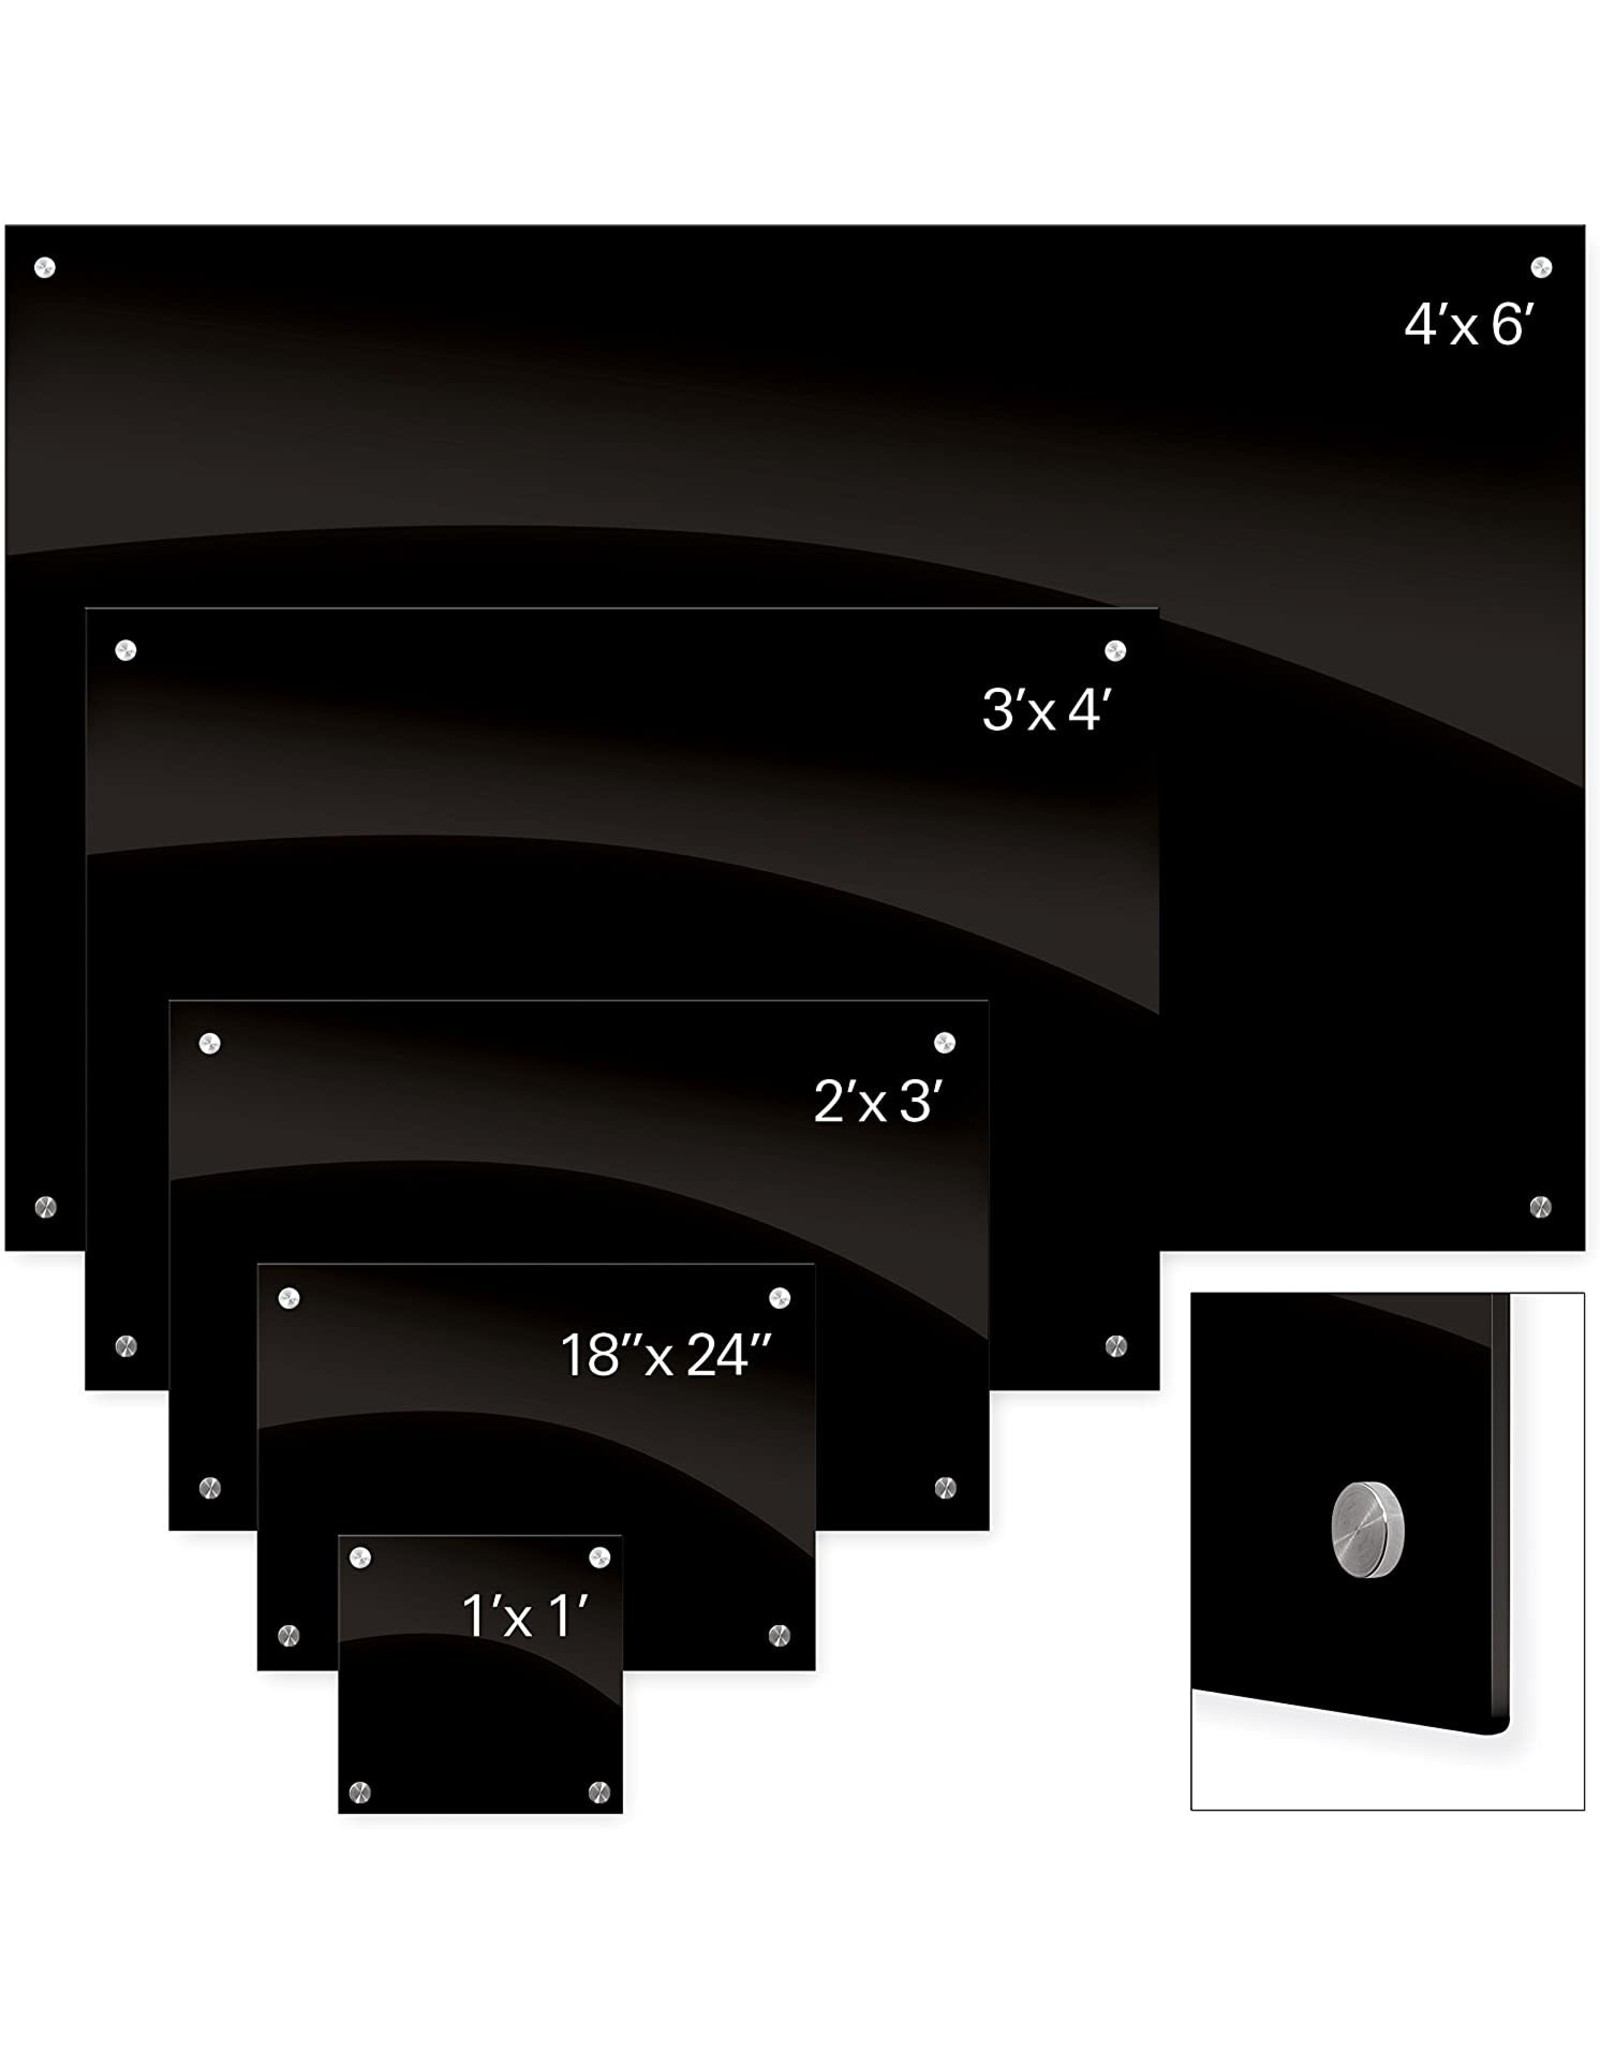 Best-Rite Best-Rite 84074 Enlighten Glass Dry Erase Whiteboard, Black 1/8 inch Tempered Glass, 3 x 4 Feet